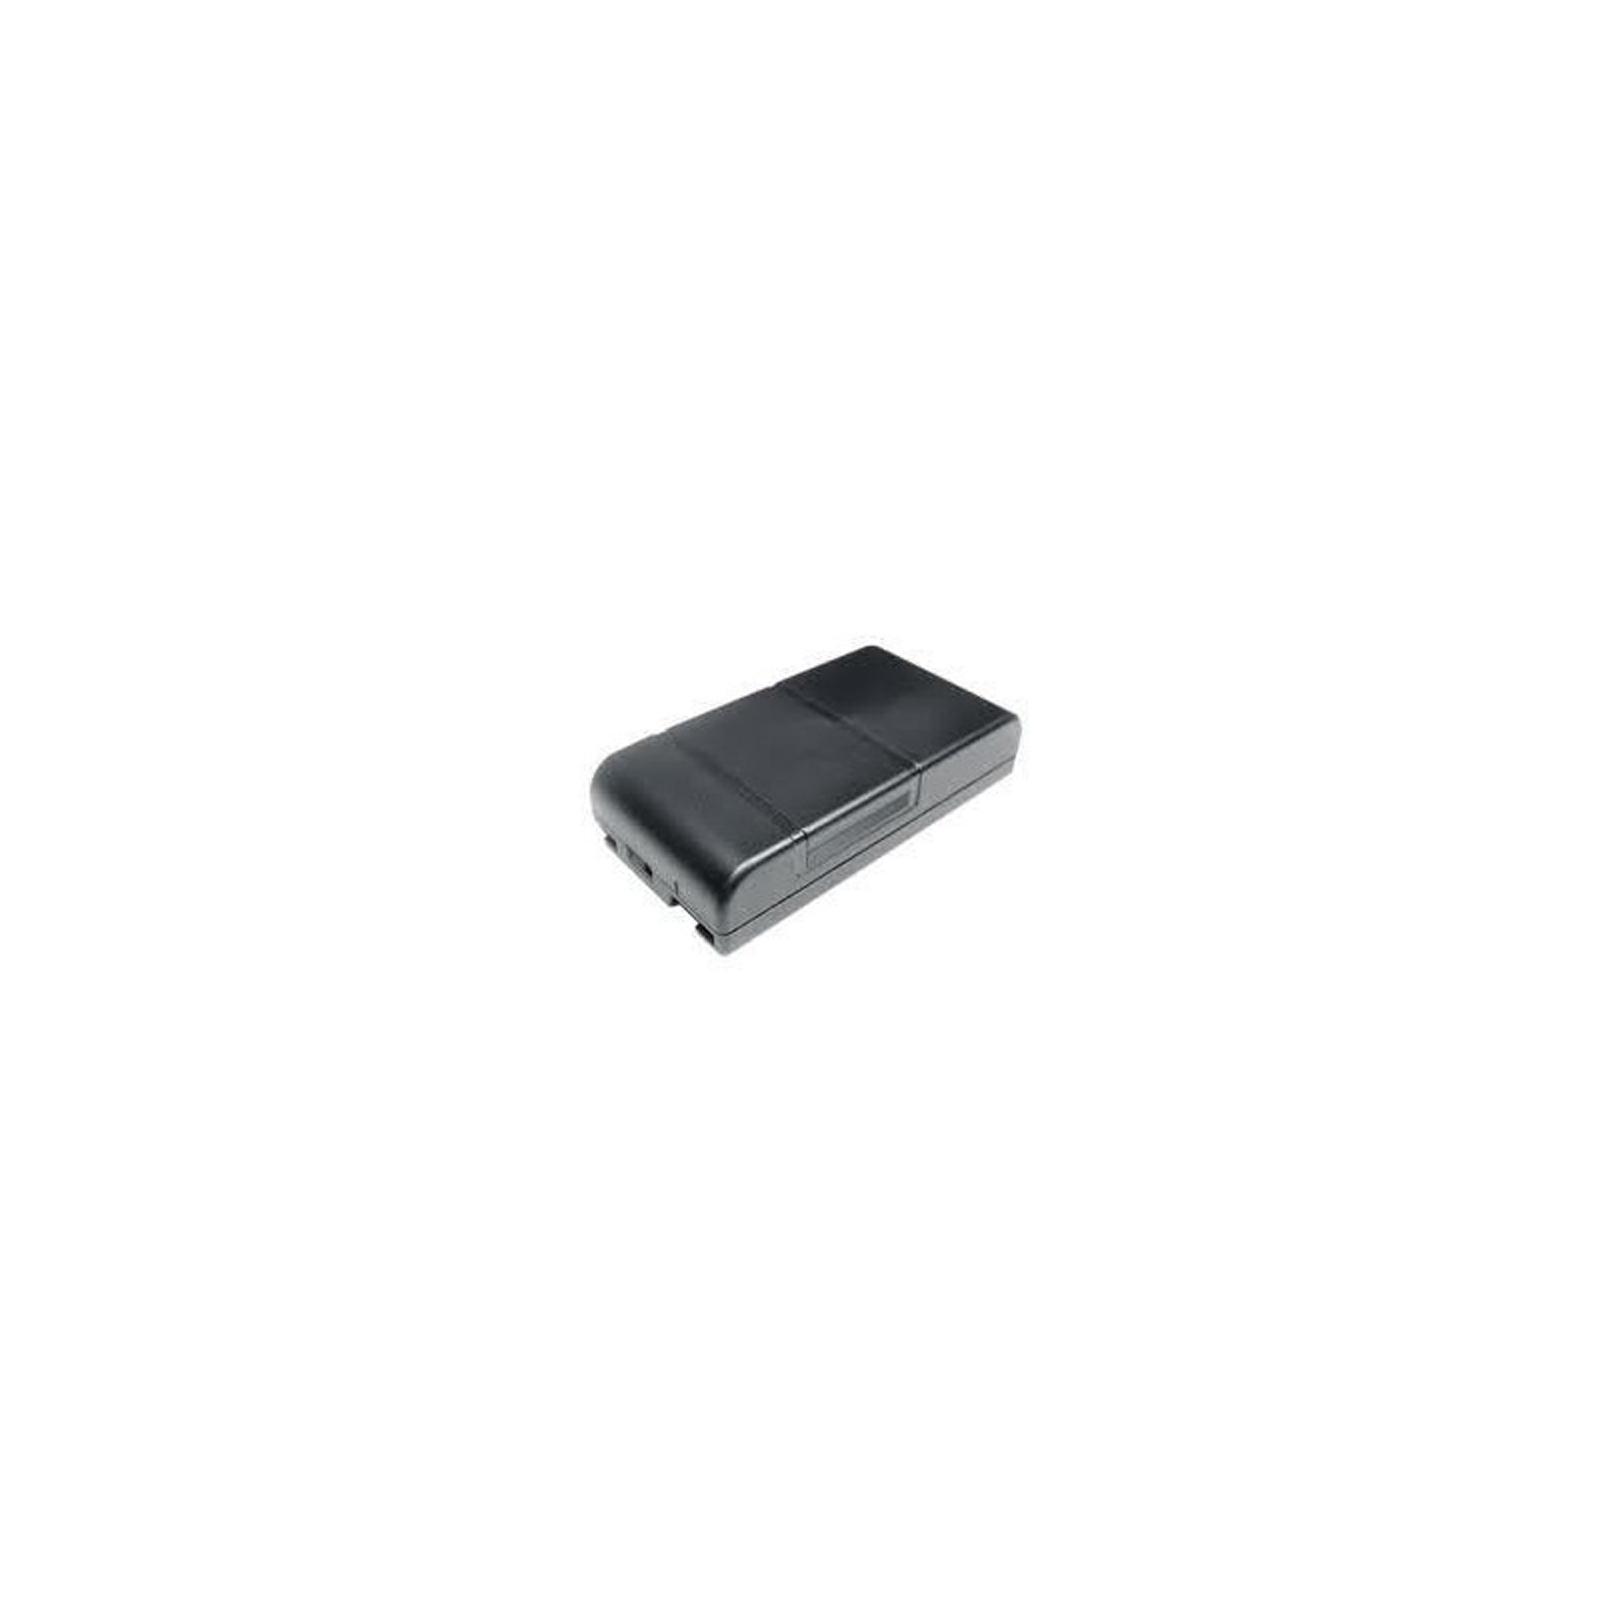 Аккумулятор к фото/видео EXTRADIGITAL JVC BN-V22U, V24U, V25U, VW-VBS2E, VW-VBS1, VW-VBH1E, NP-77 (DV00DV1333)